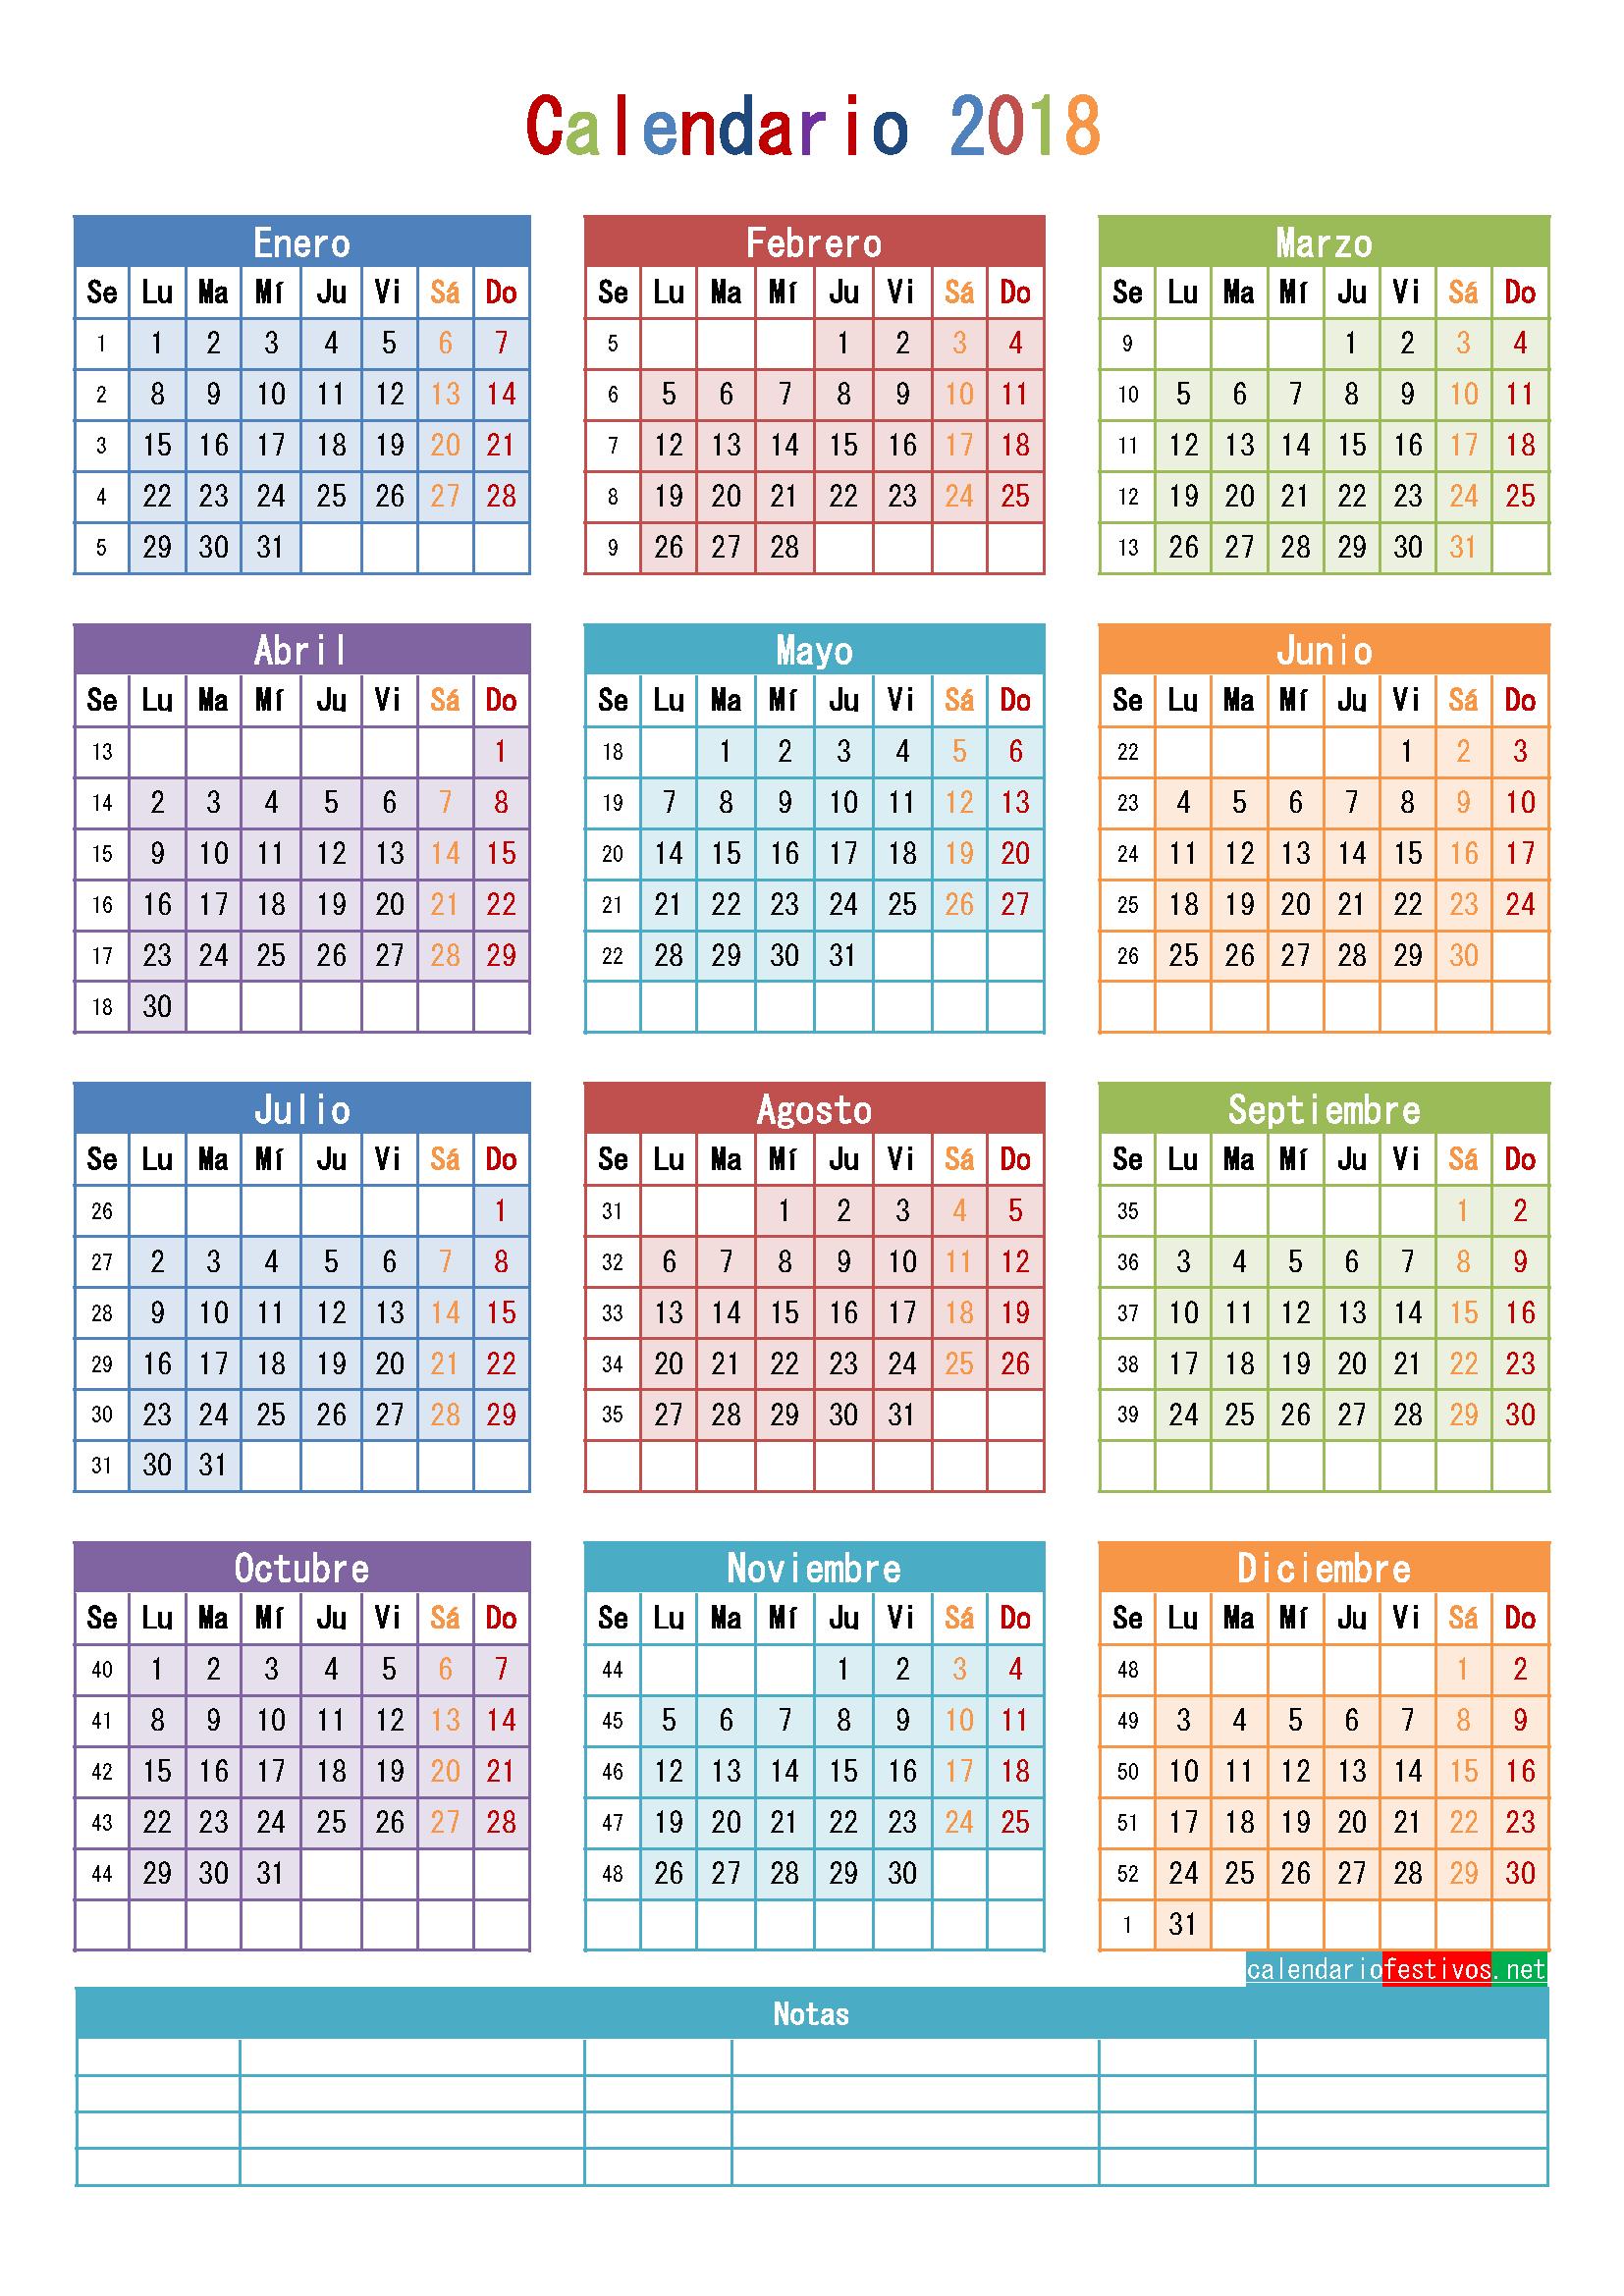 calendario 2018 para imprimir anual mensual escolar infantil y lunar